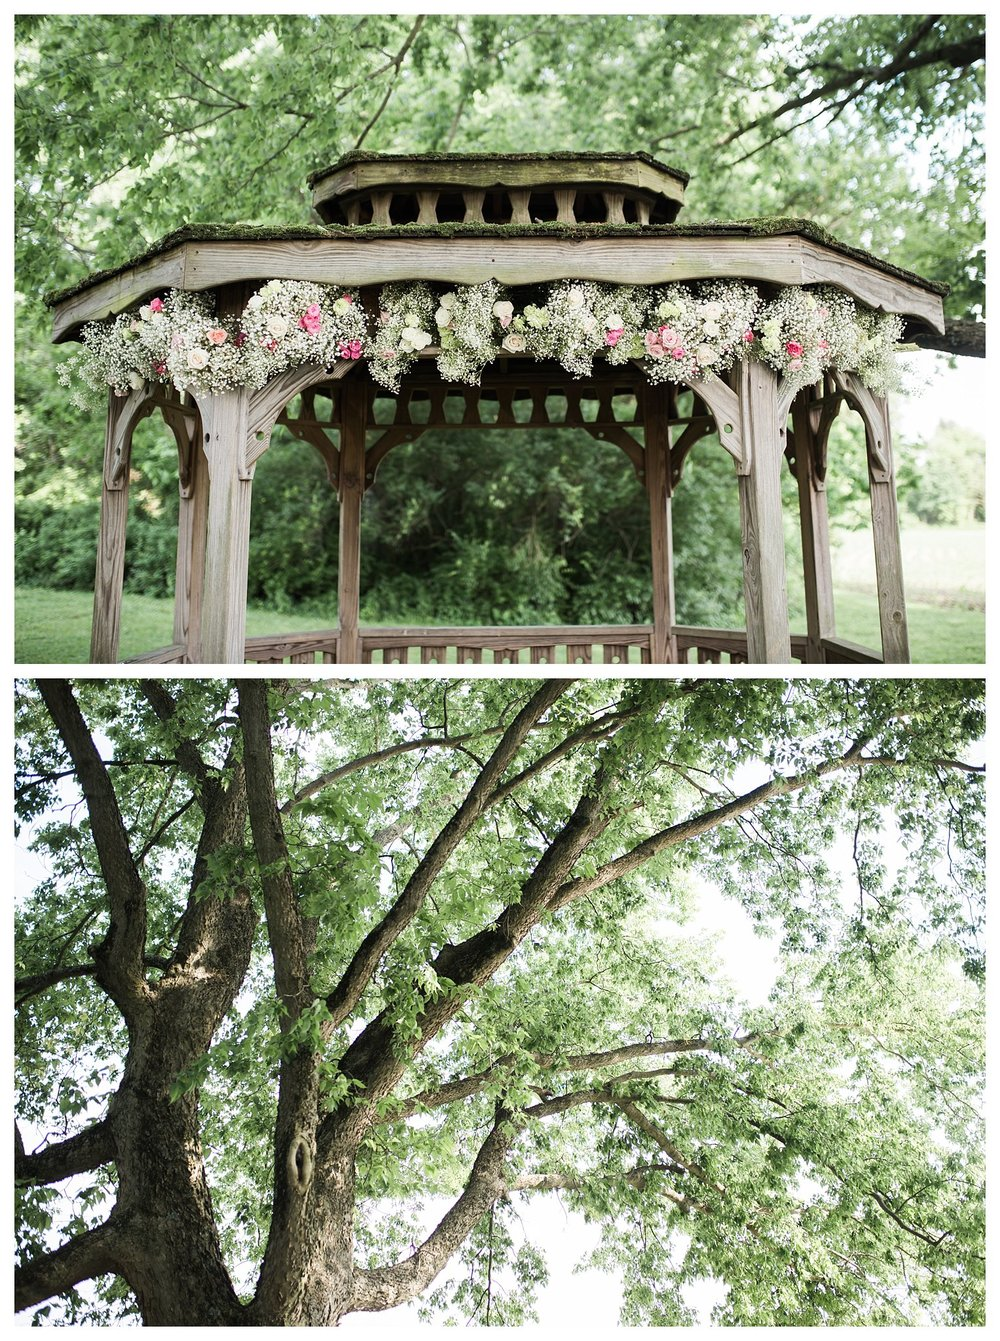 everleigh-photography-cincinnati-wedding-photographer-1913-heartland-barn-northern-kentucky-weddiing-photographer-amanda-and-chris-31